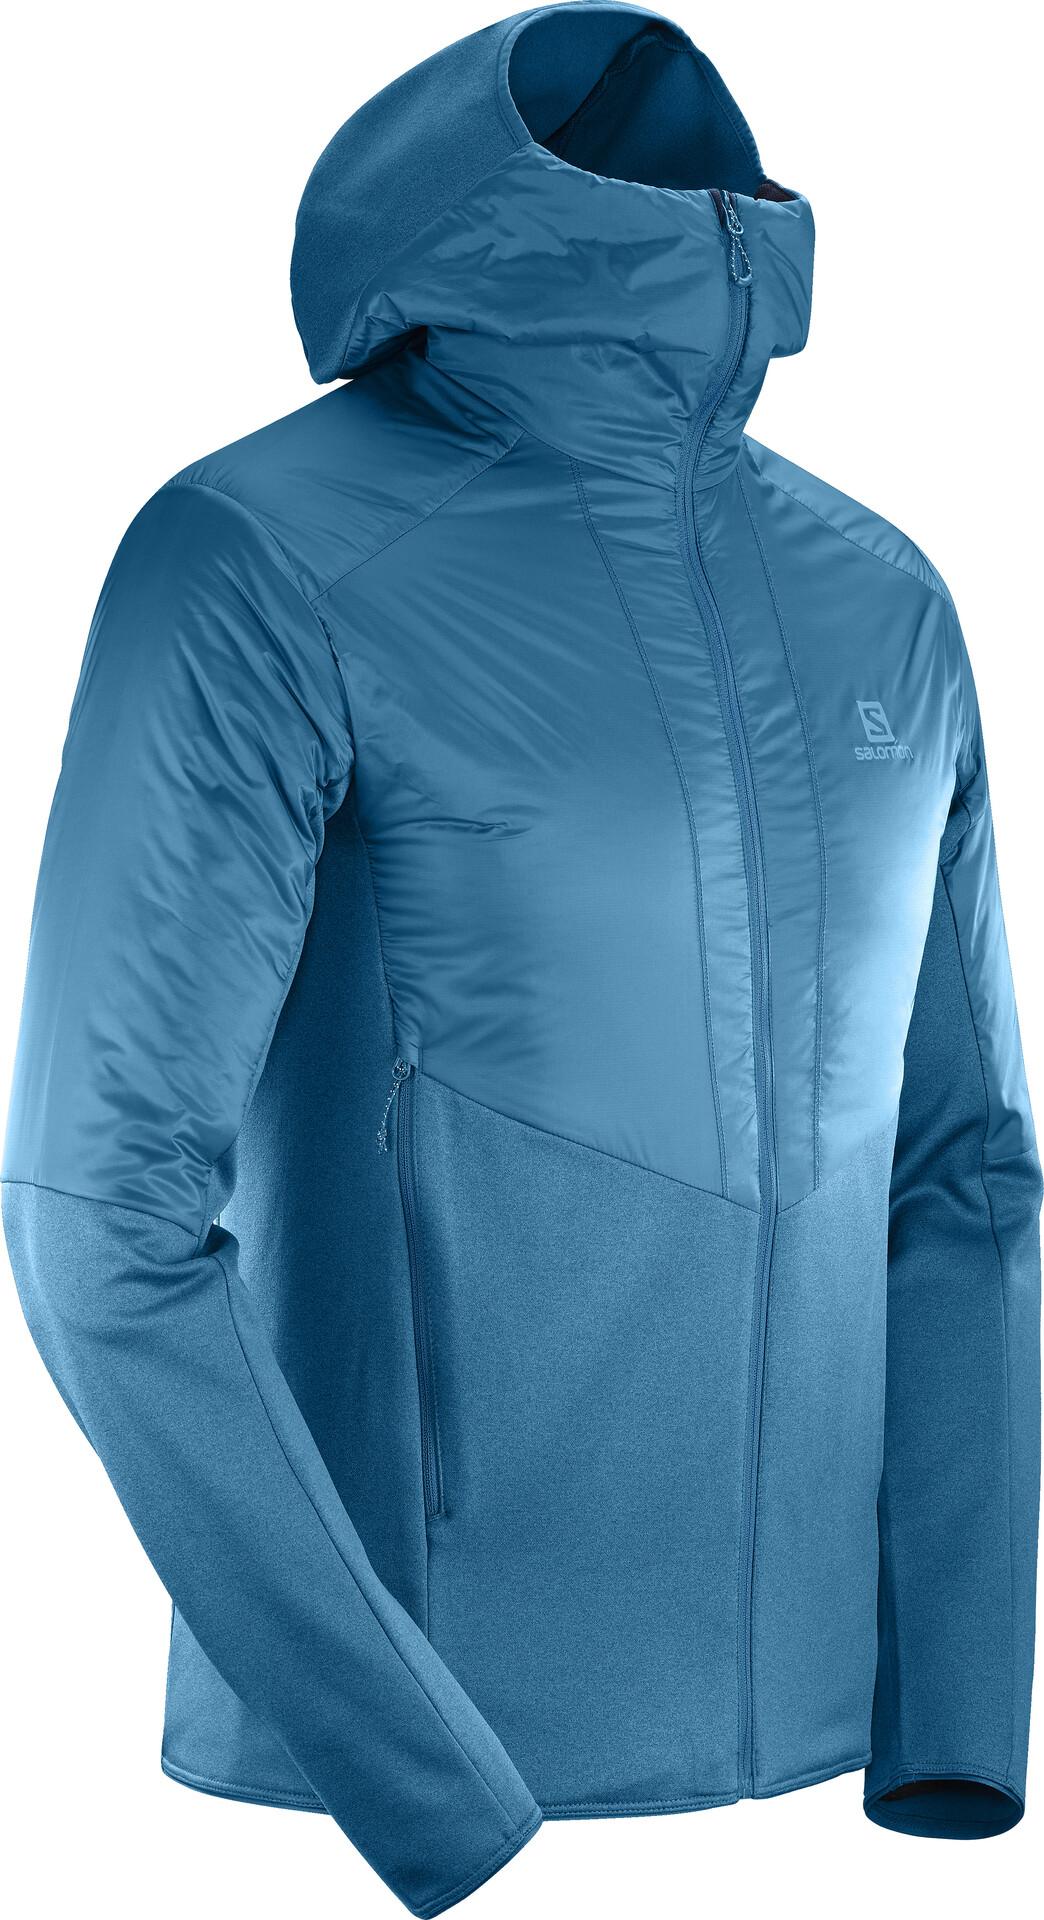 Salomon Outline Warm Jacket Men lyons blue